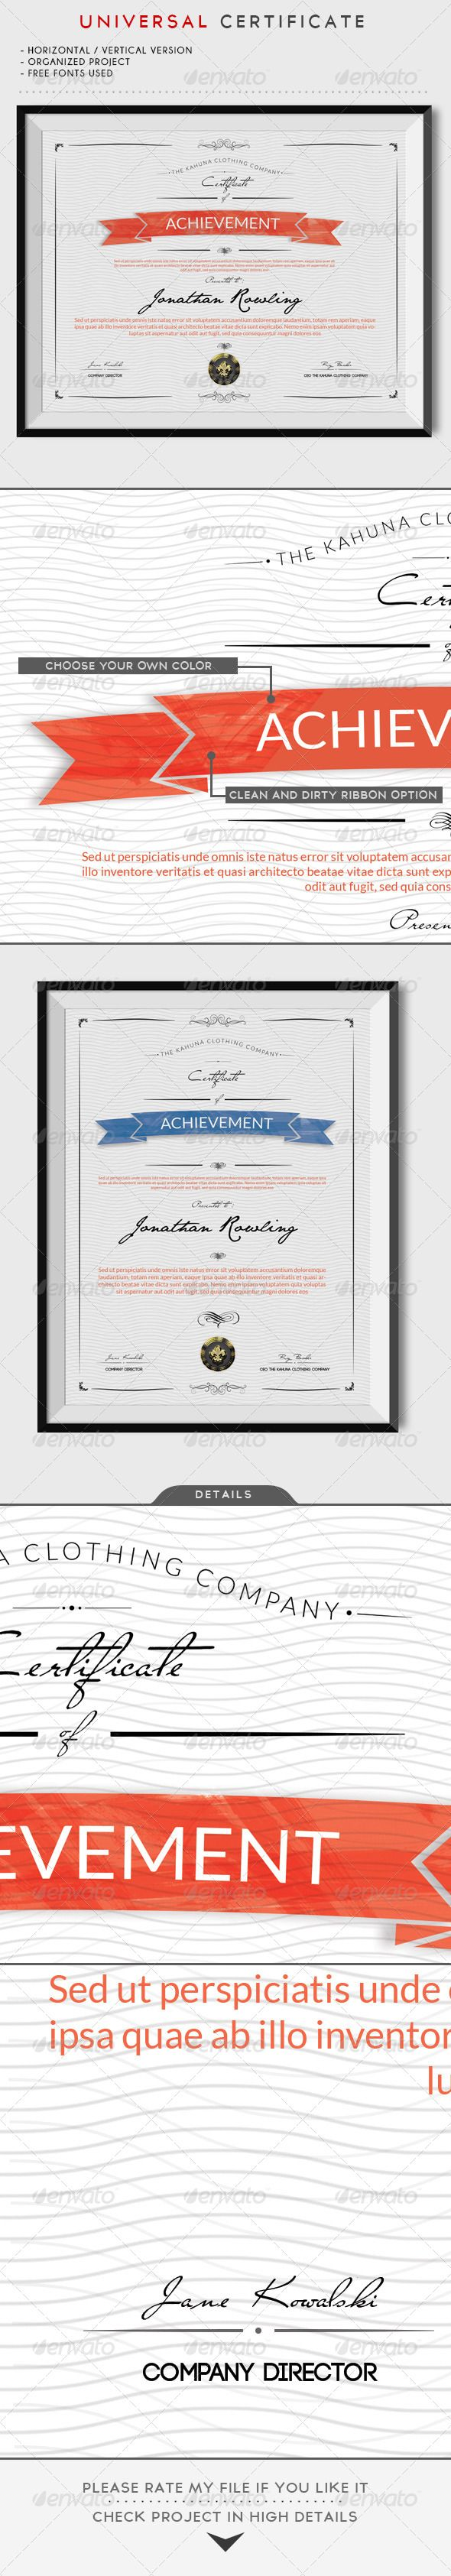 60 best 证书 images on Pinterest   Certificate templates ...